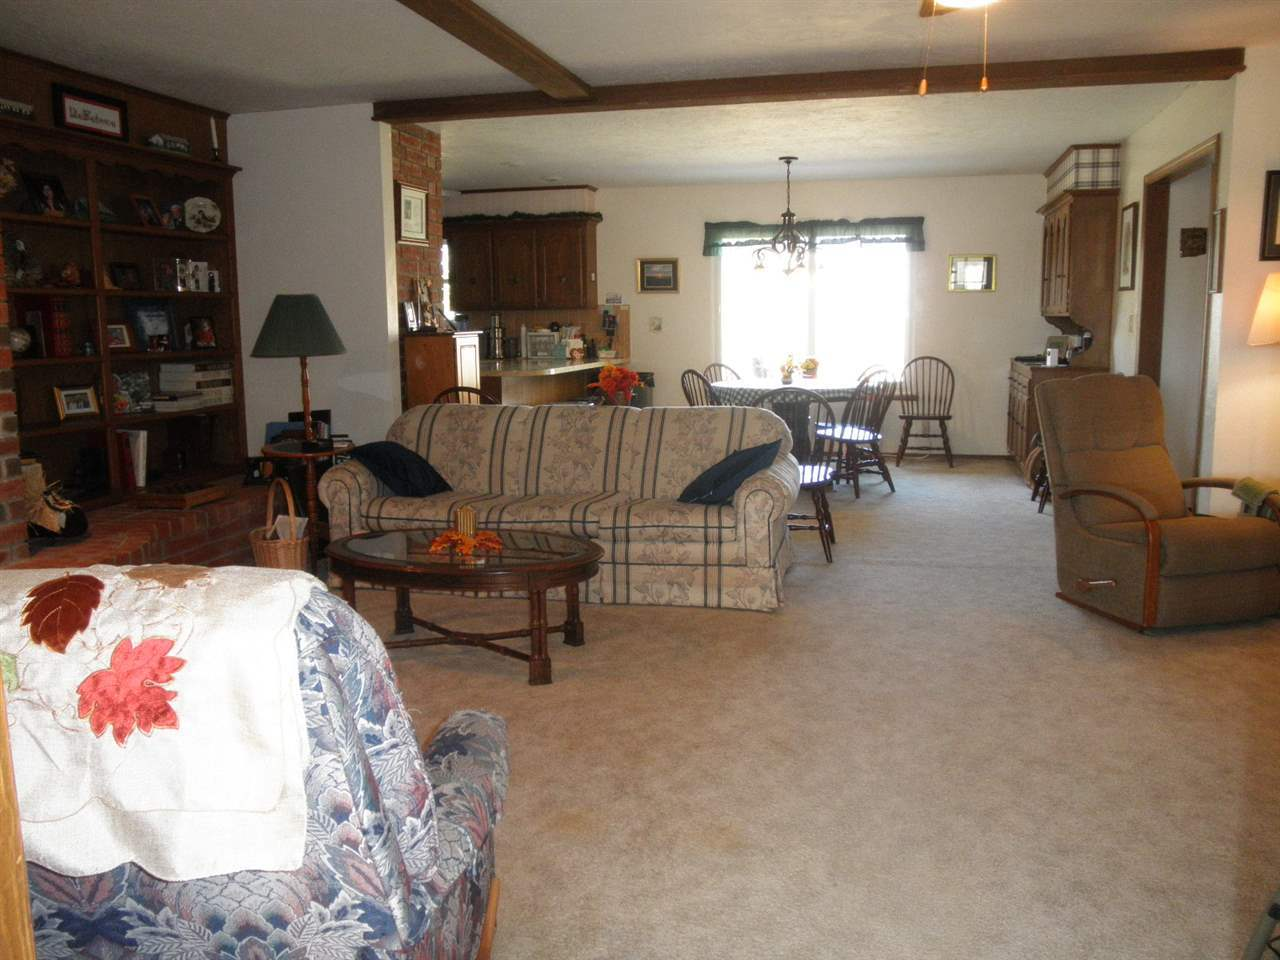 Sold Cross Sale W/ MLS | 1275 S Enterprise Road  Ponca City, OK 74604 2